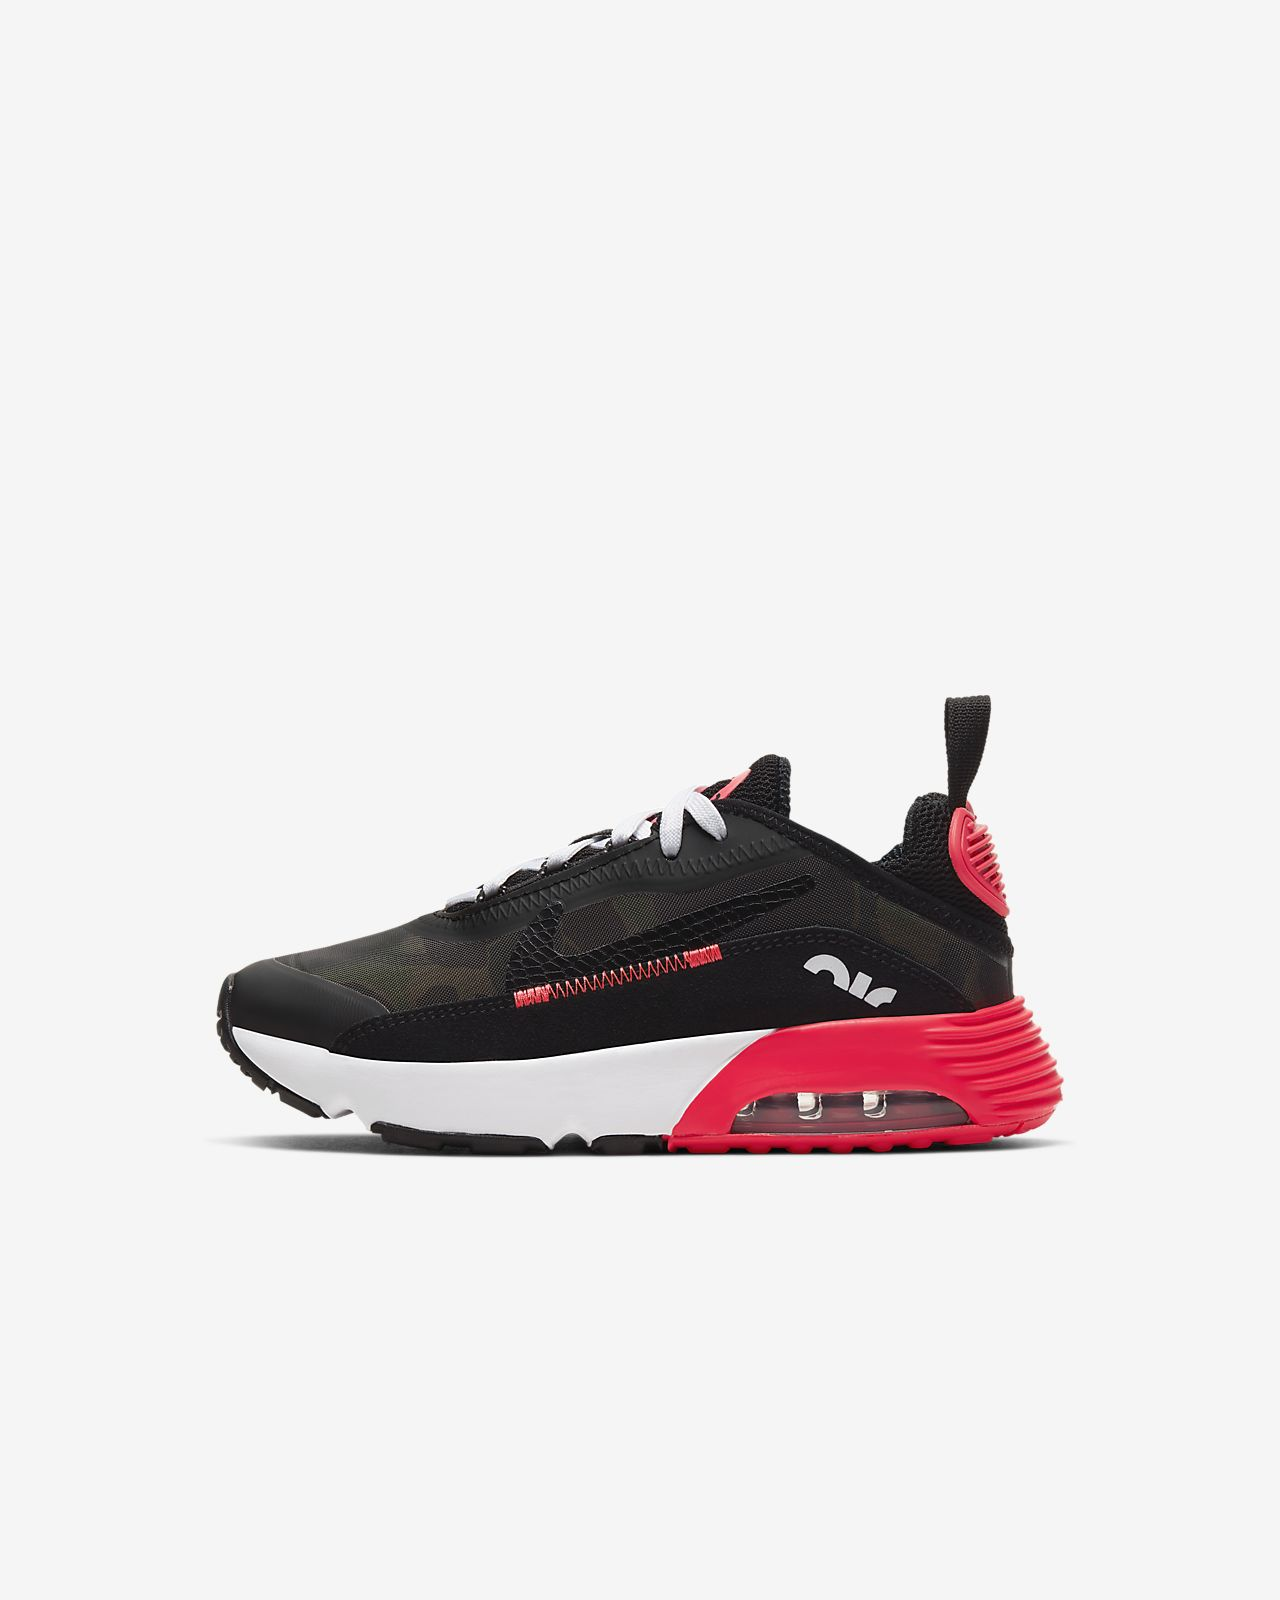 Nike Air Max 2090 SP Little Kids' Shoe